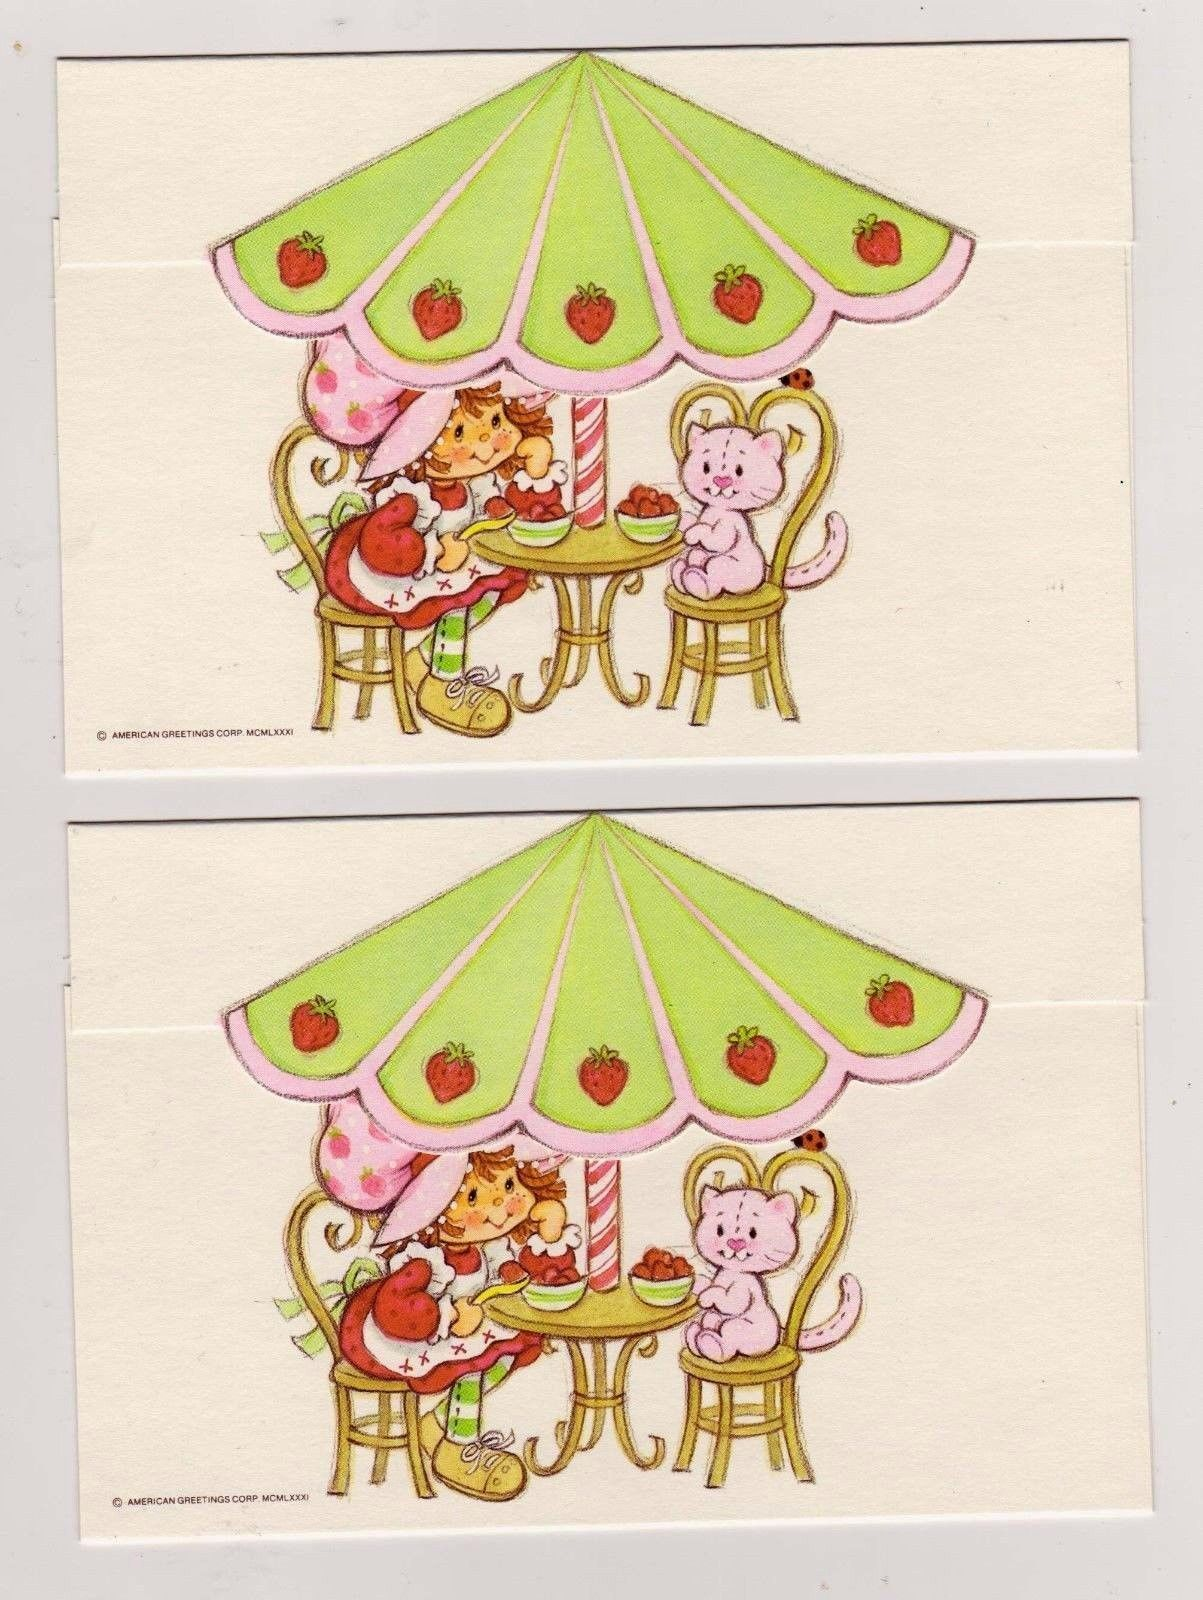 Httpebayitmvtg tcfc strawberry shortcake blank note httpebayitmvtg tcfc strawberry shortcake blank note card lot of 2 american greetings 391305846428hashitem5b1ba55e9cgpqoaaoswl9bwm m4hsunfo